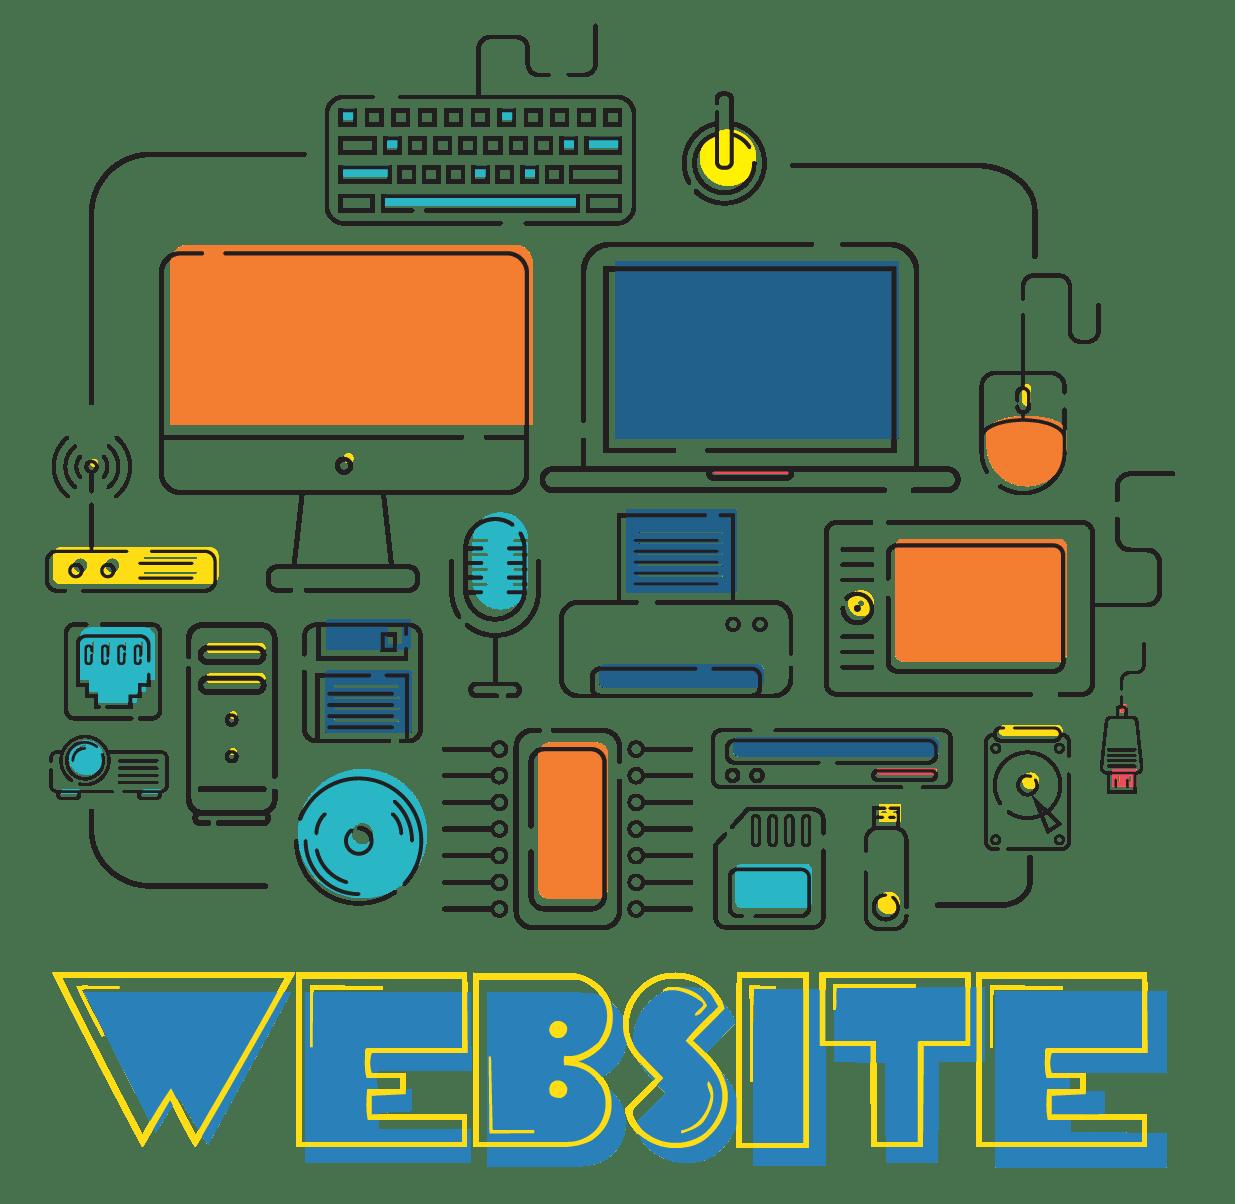 WEBYAVIET hosting ssd tot nhat